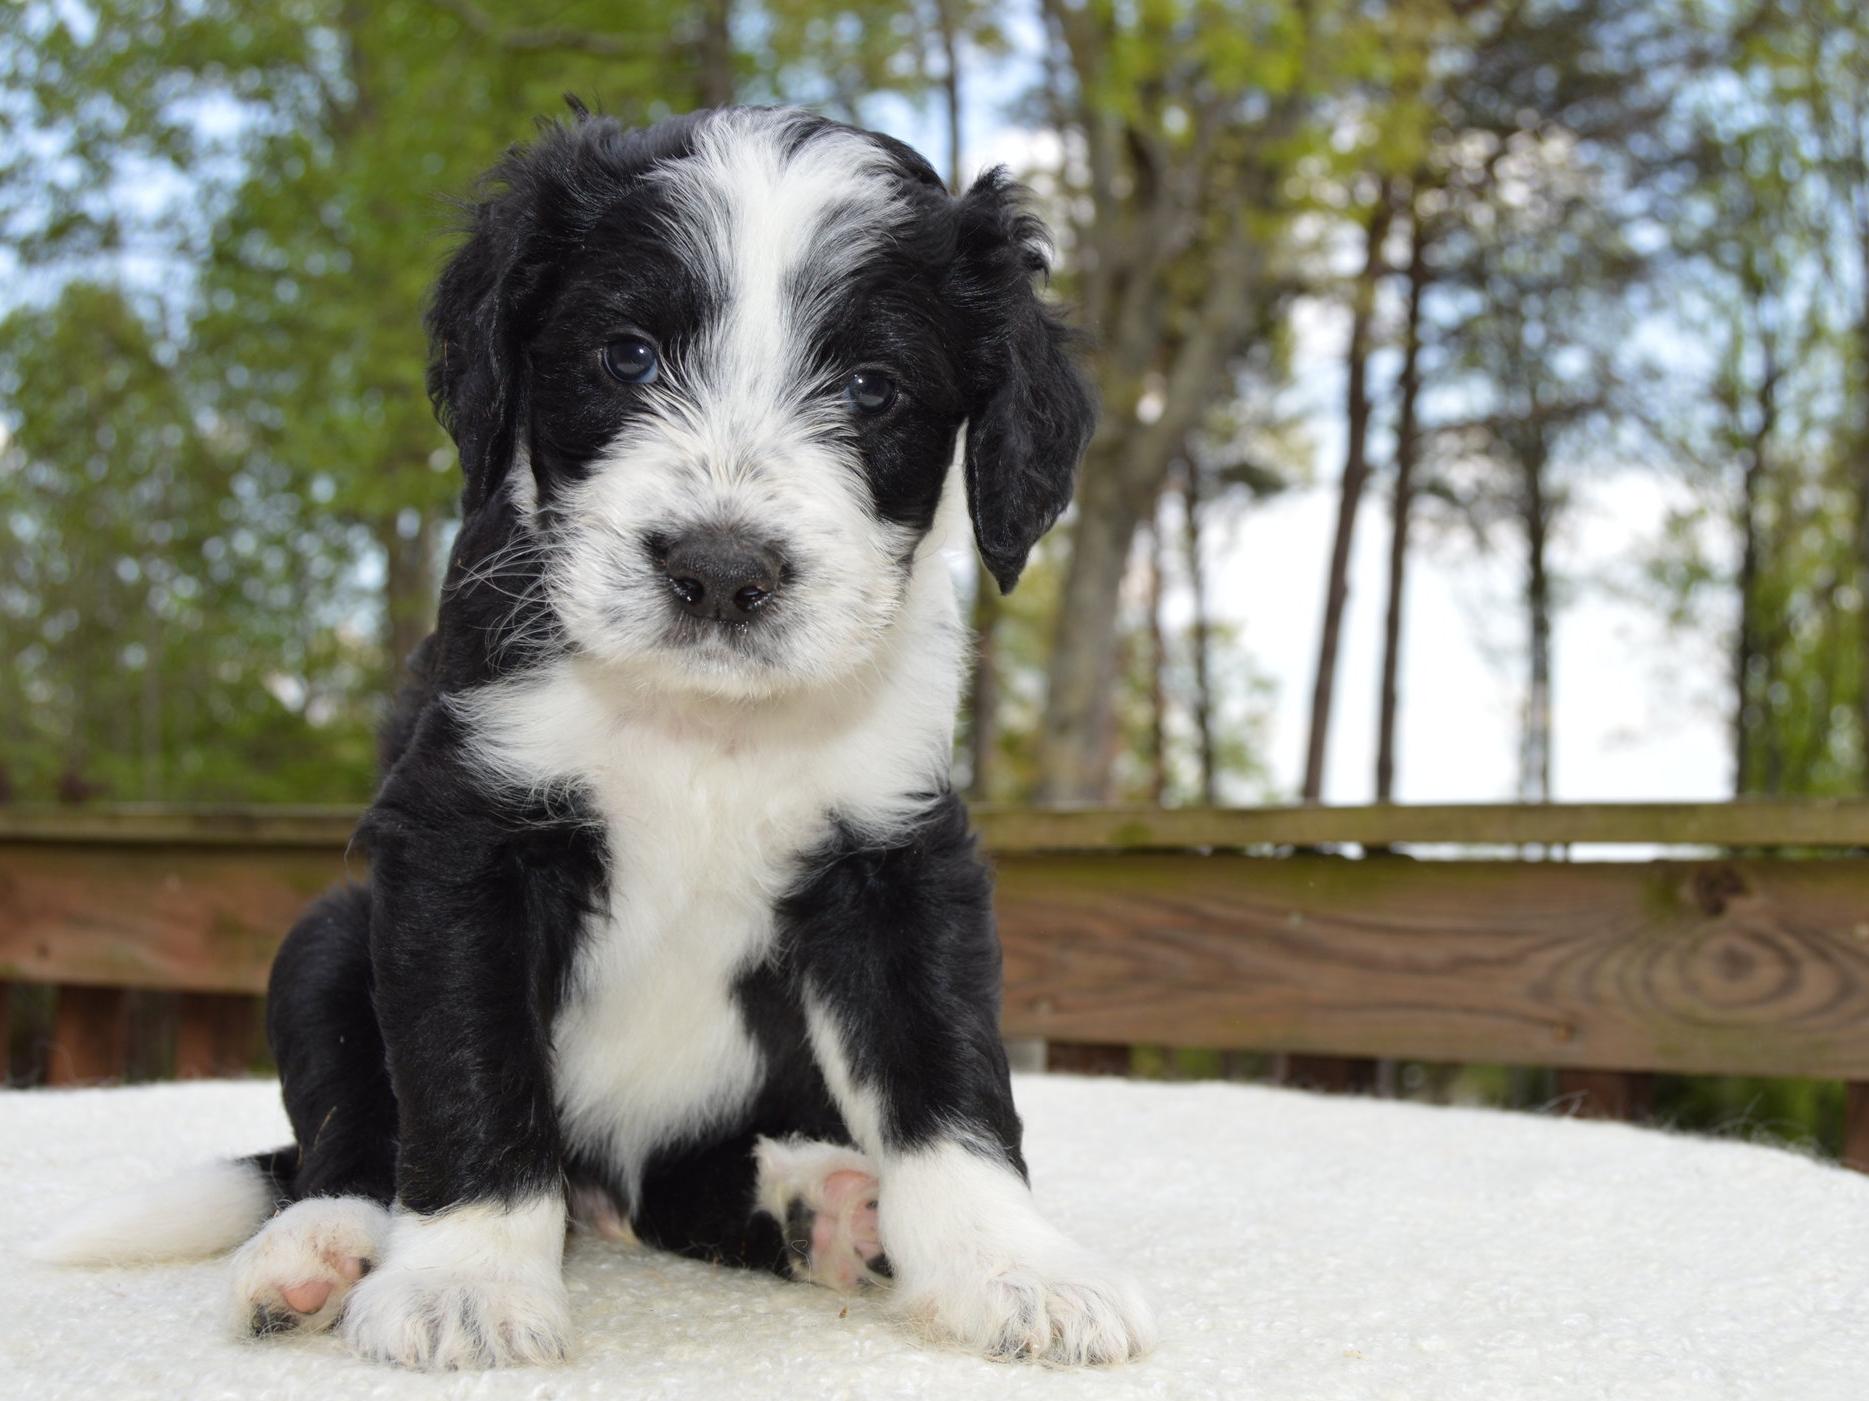 Sheepadoodle pups - gentle, inquisitive, & loyal companions